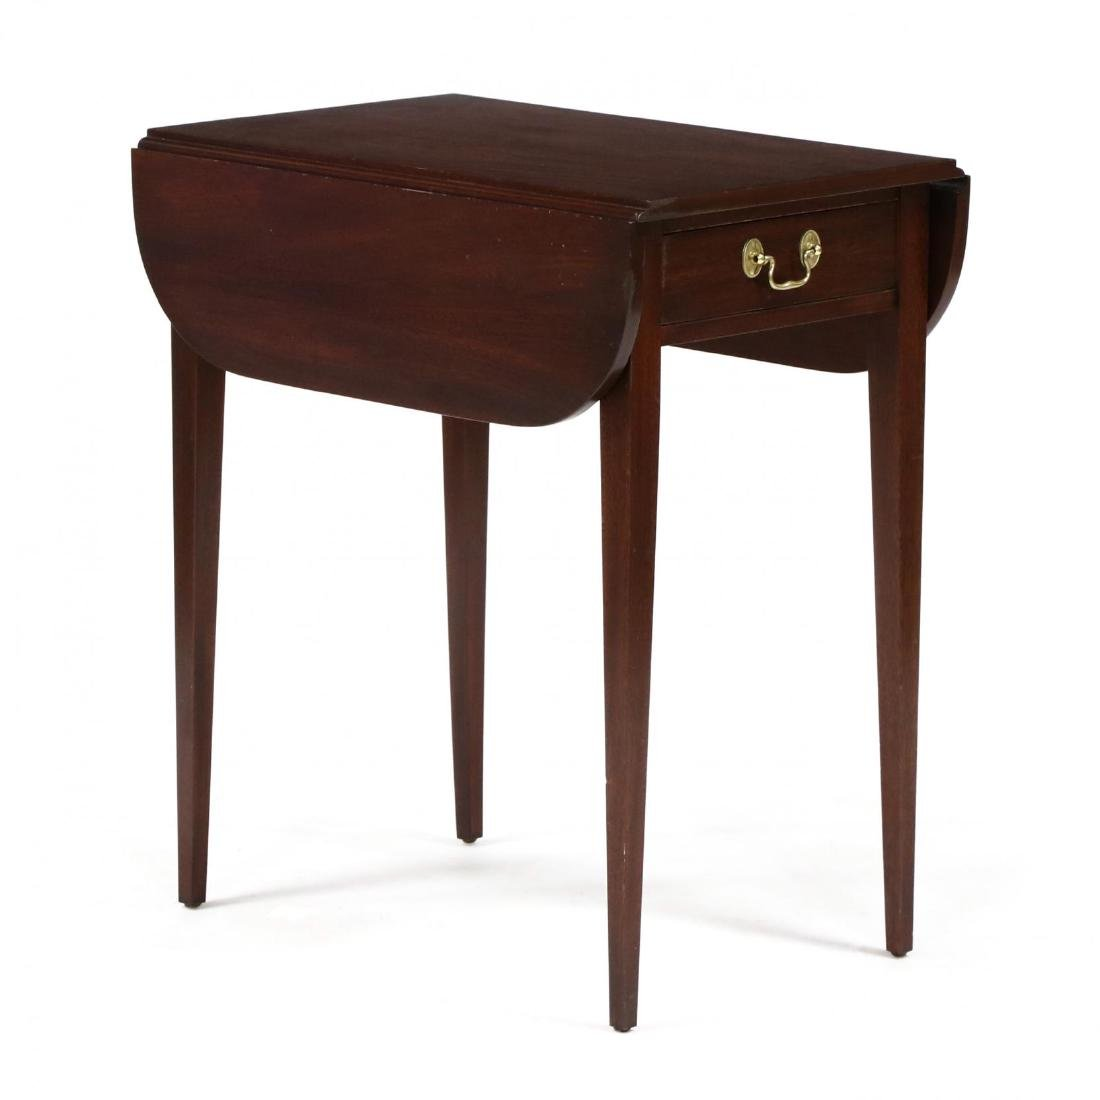 Henkel Harris, Mahogany Pembroke Table